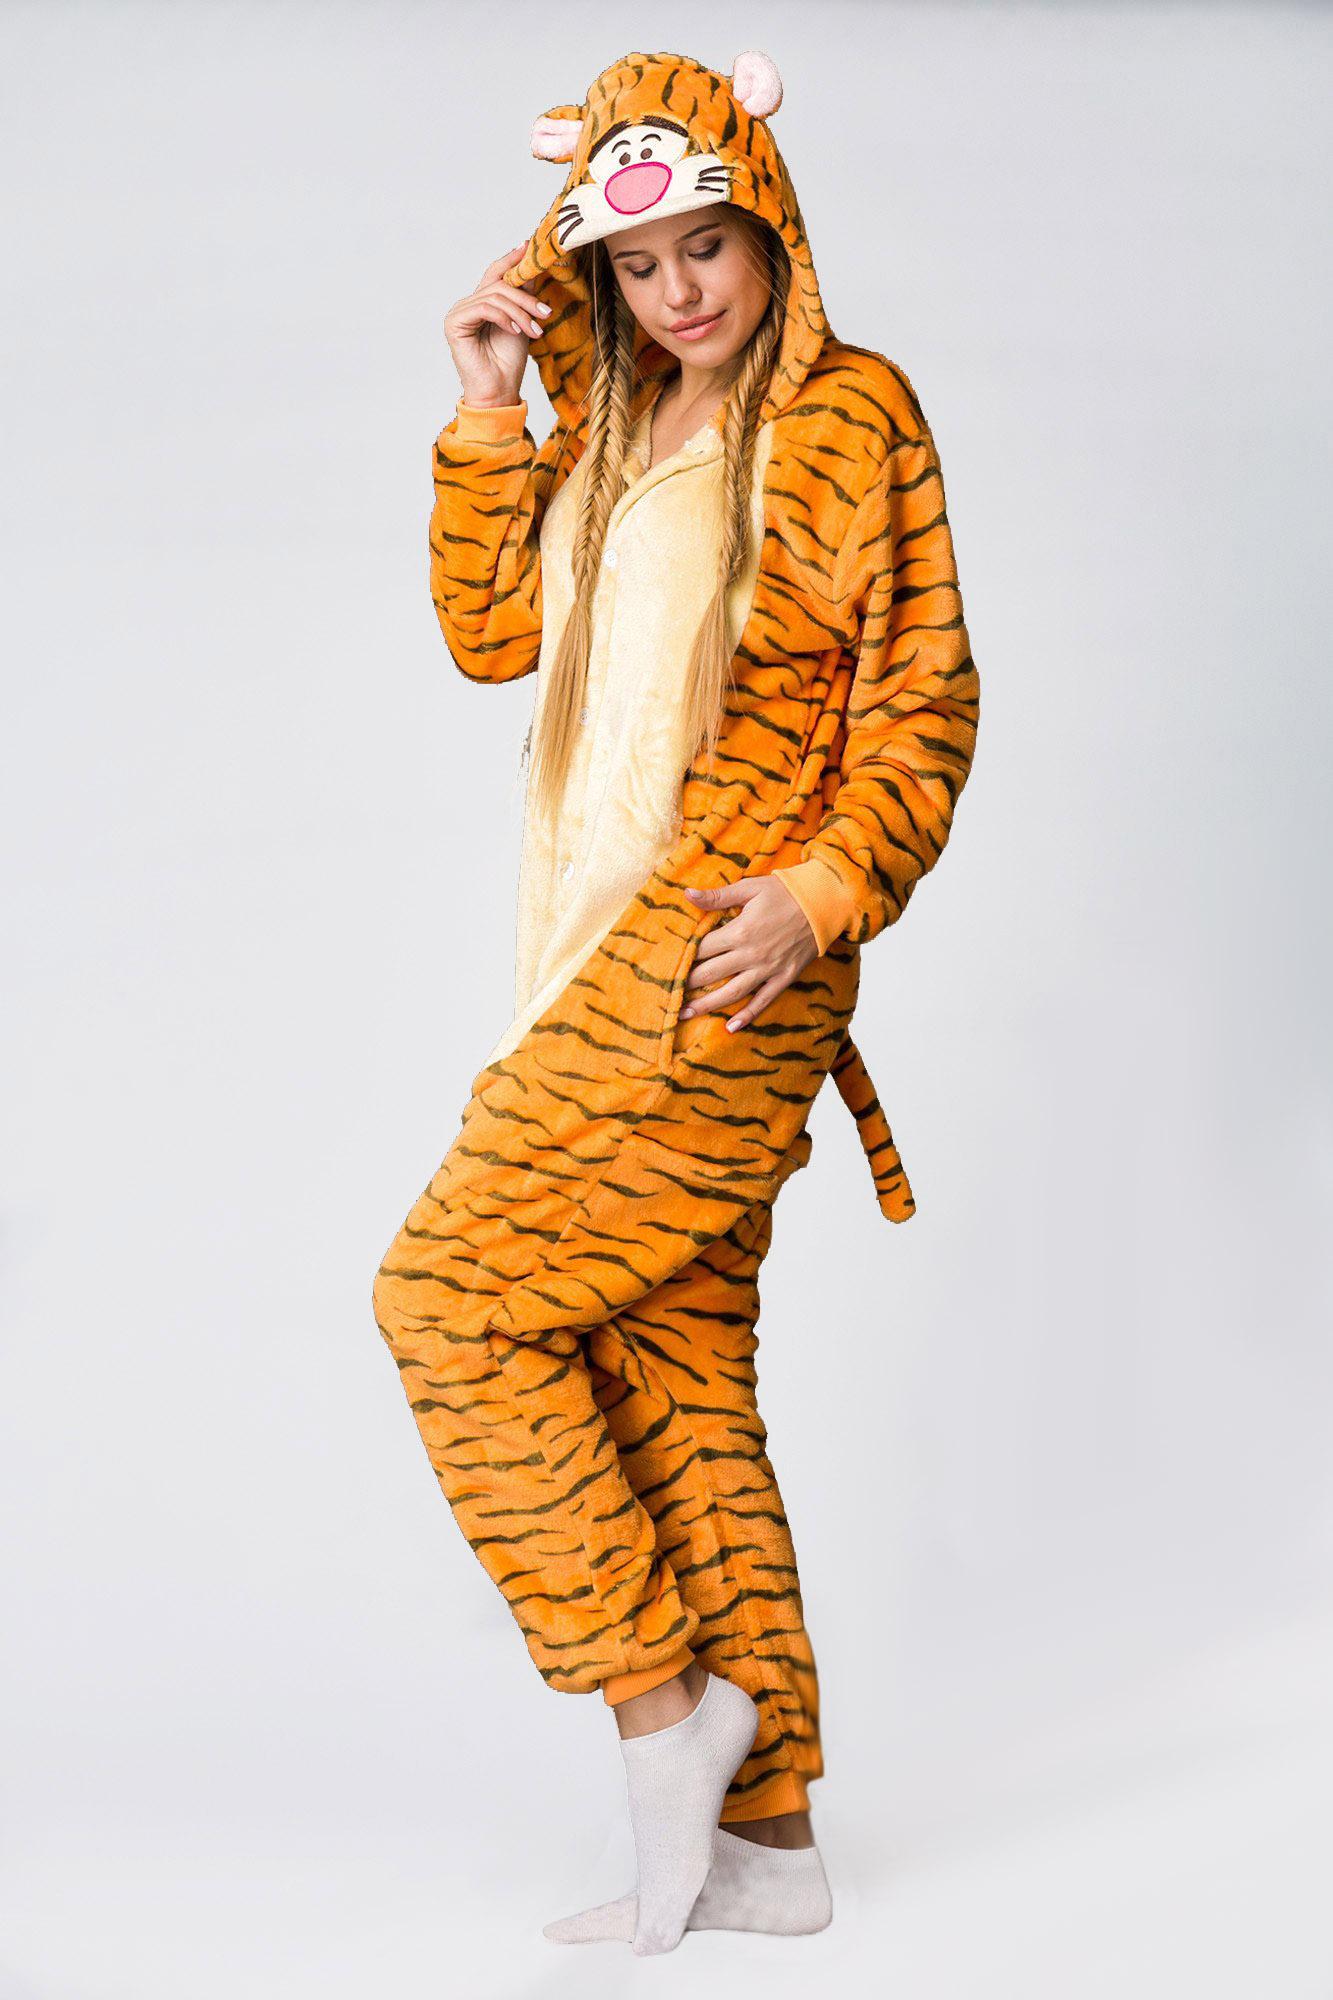 Пижама Тигра кигуруми купить в СПБ e9f490fe45328